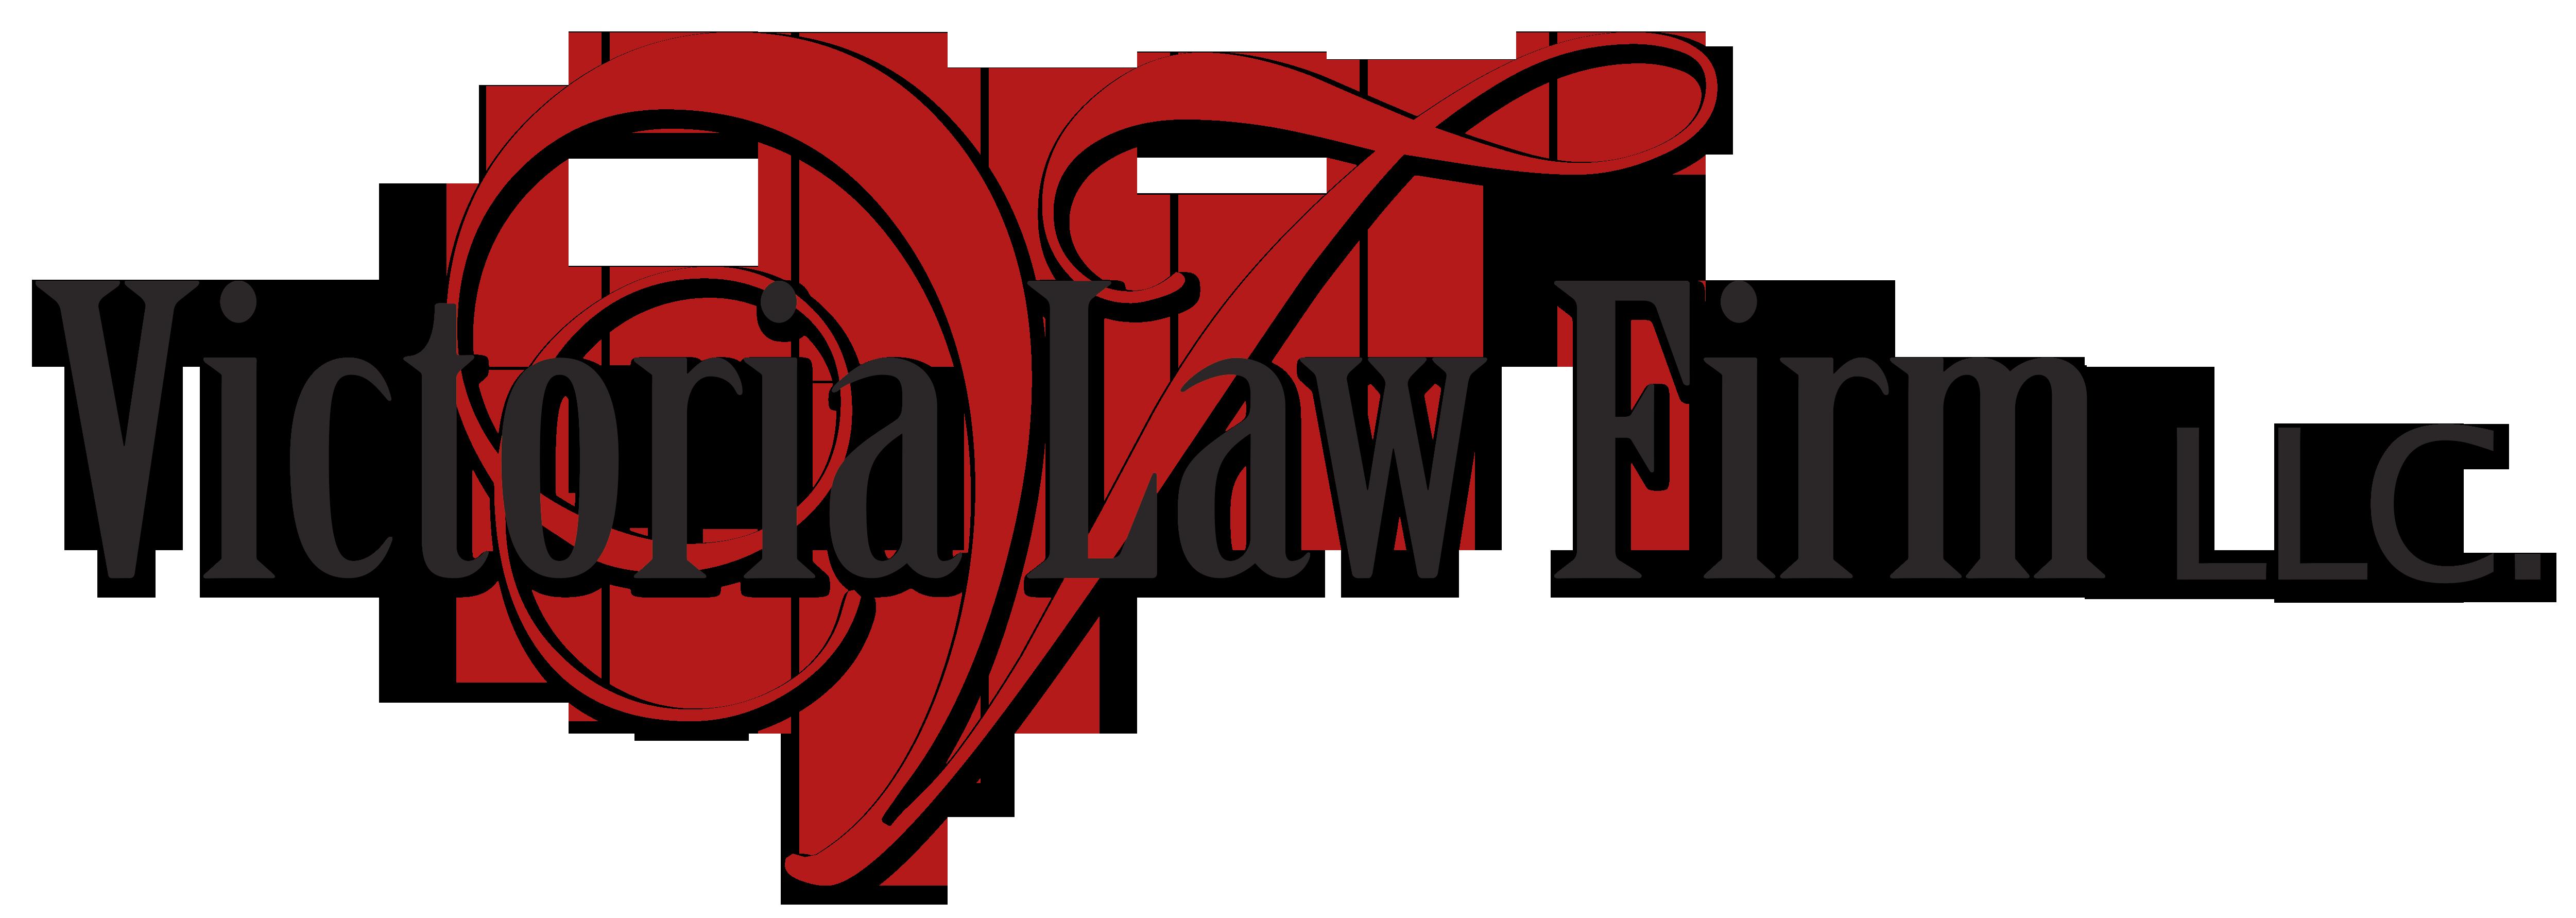 Top lawyers south carolina attorneys victoria law firm llc solutioingenieria Gallery